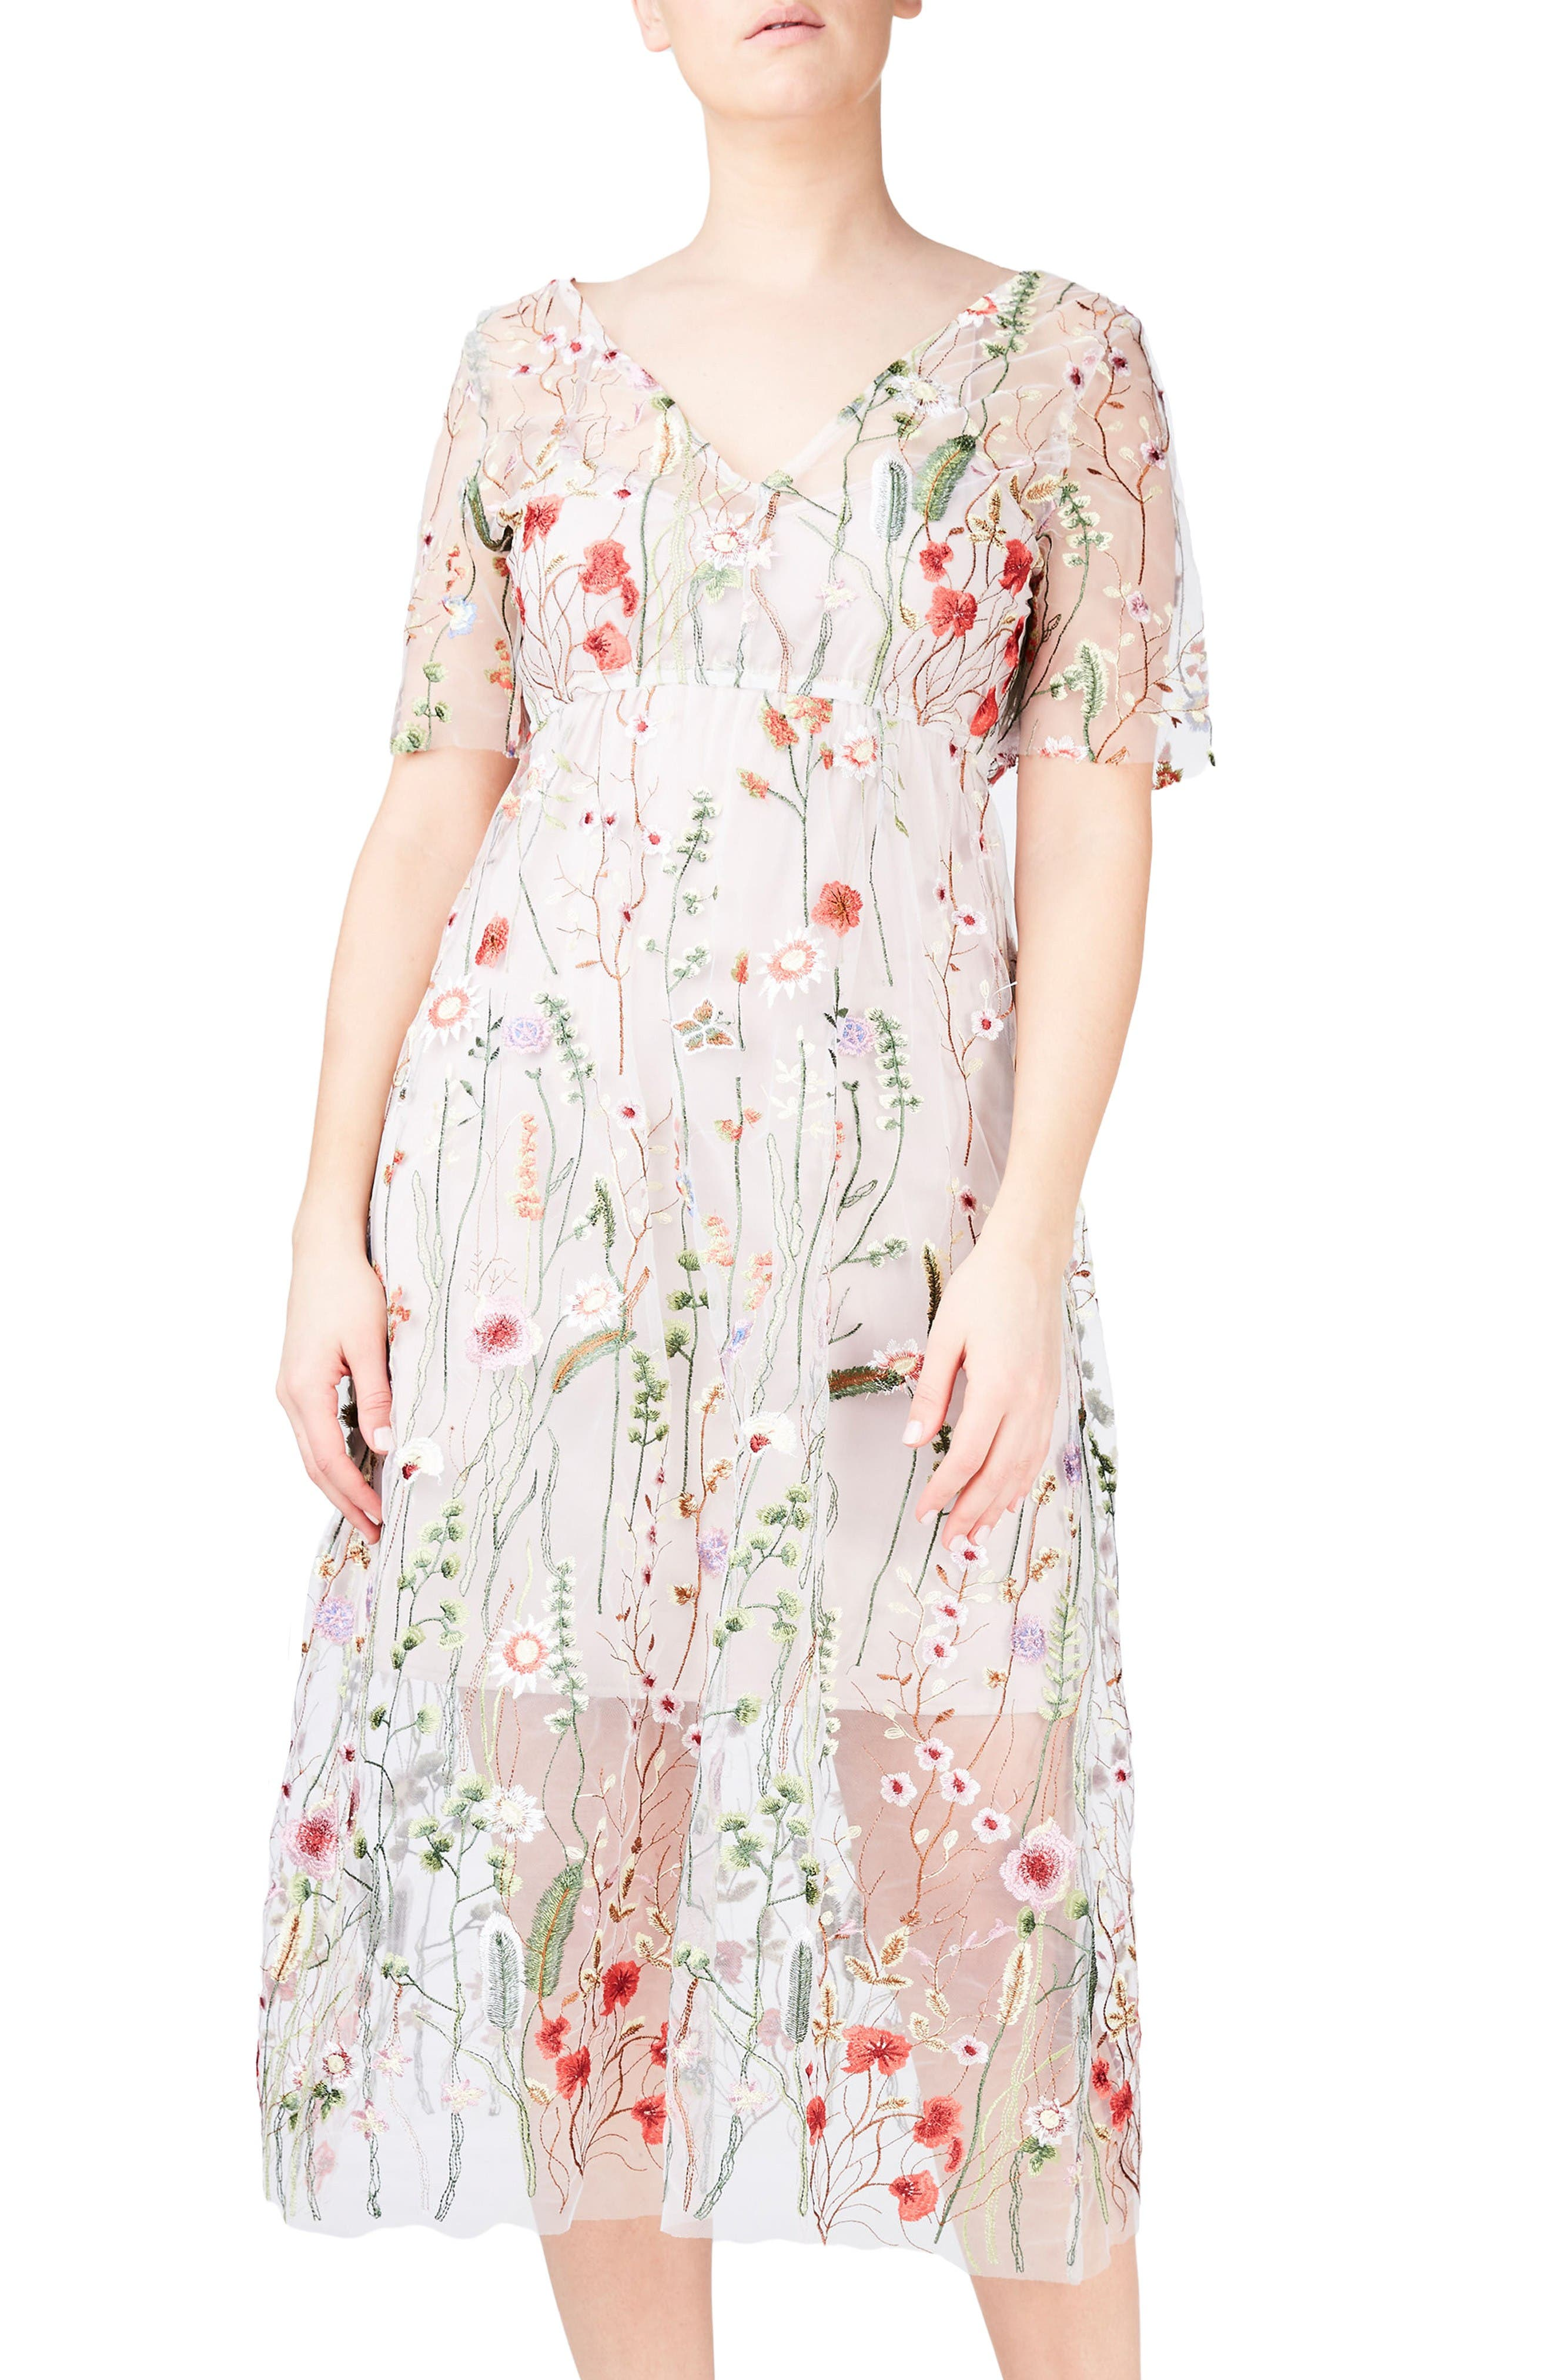 ELVI Floral Embroidered Floral Net Dress (Plus Size)